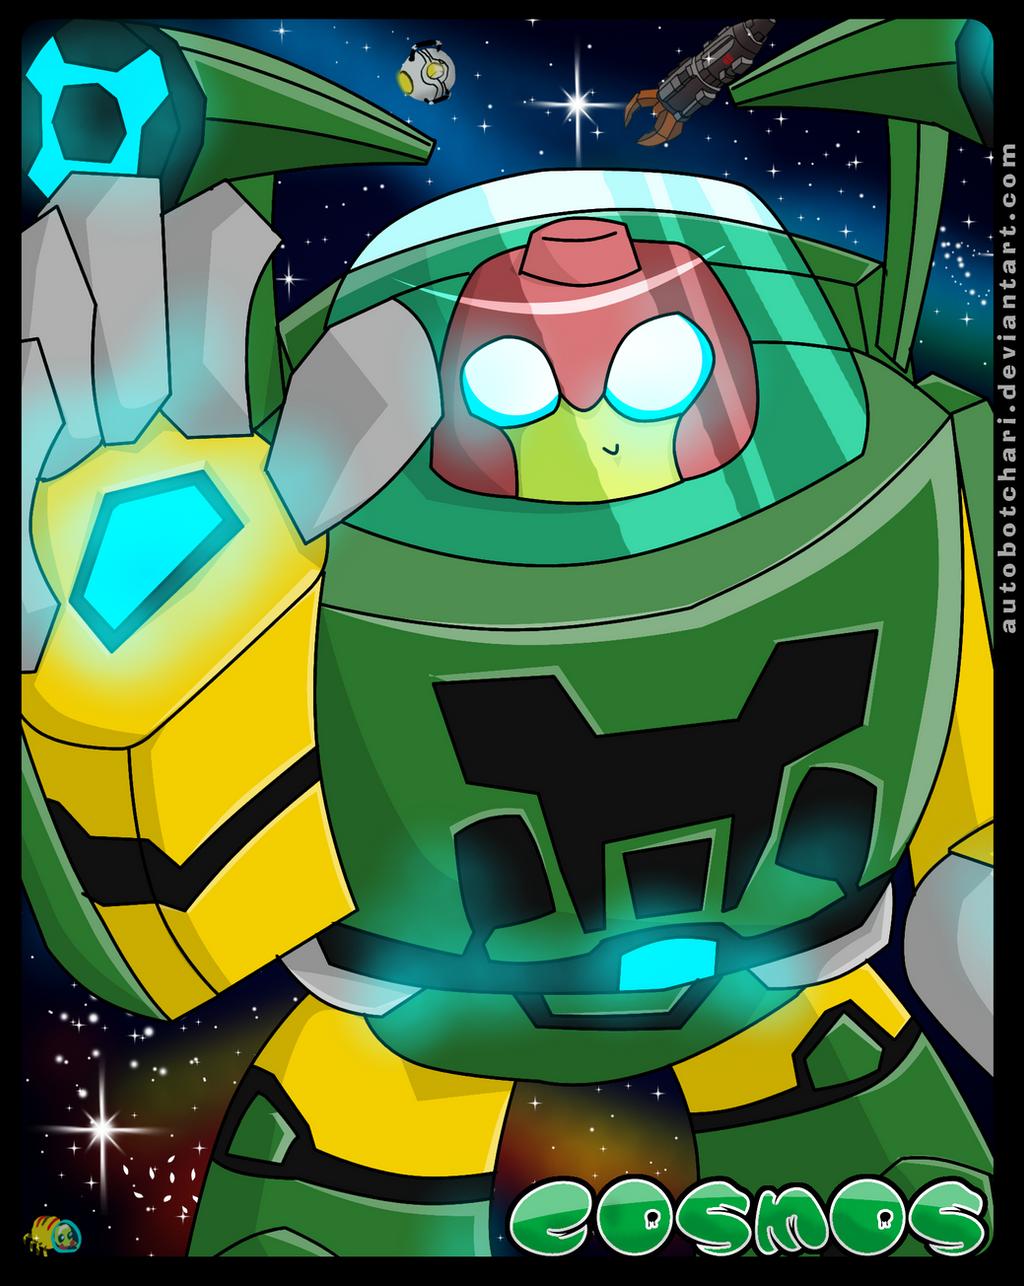 TFA Cosmos by autobotchari